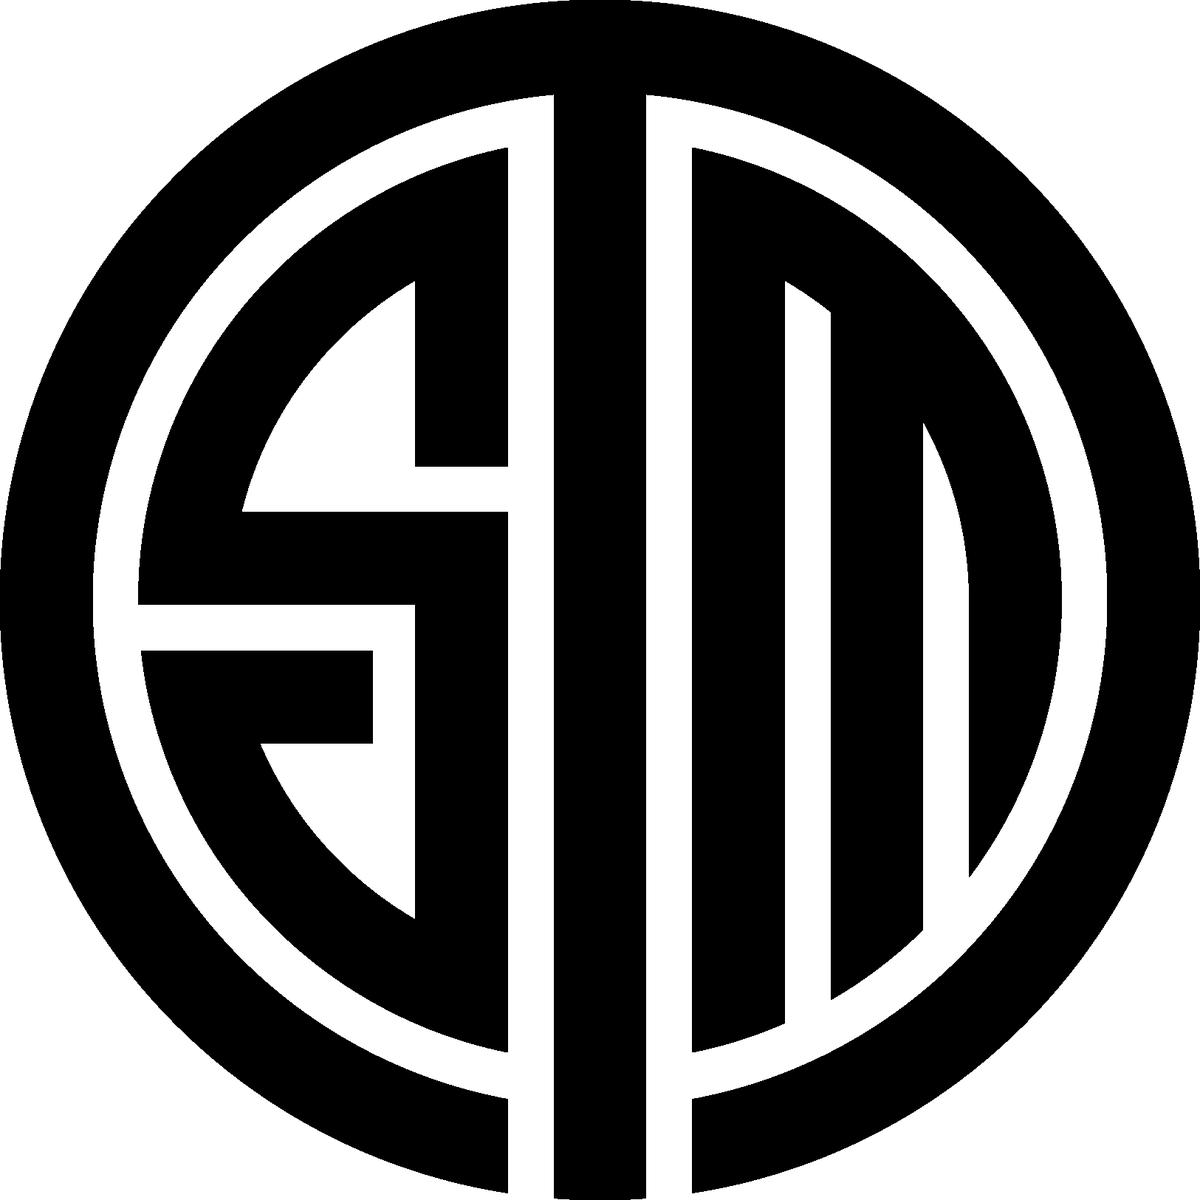 SIG Sauer Logo / Industry / Logonoid.com